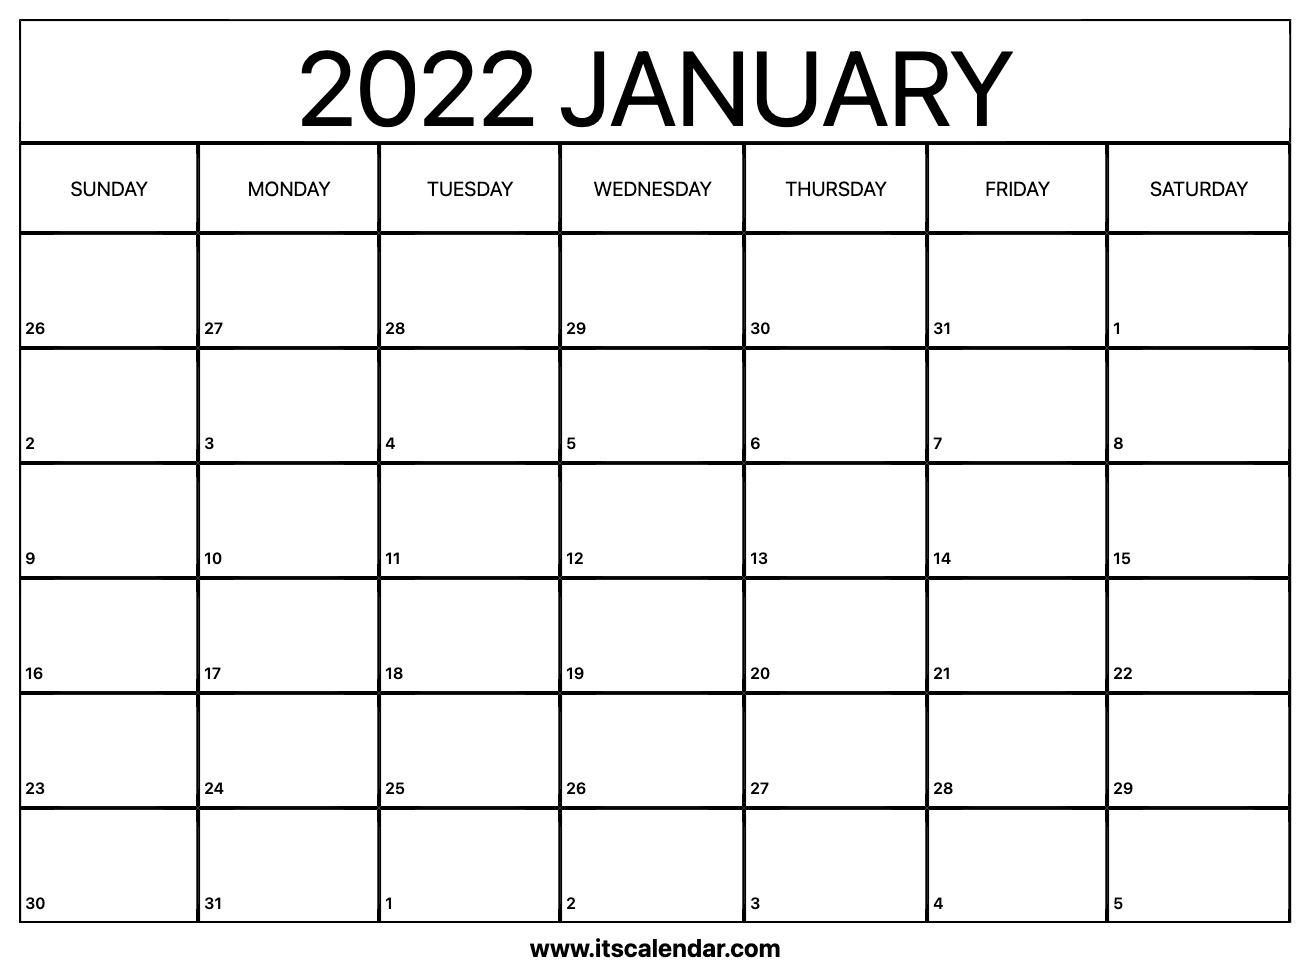 Free Printable January 2022 Calendar Inside Printable Calendars January 2022 To December 2022